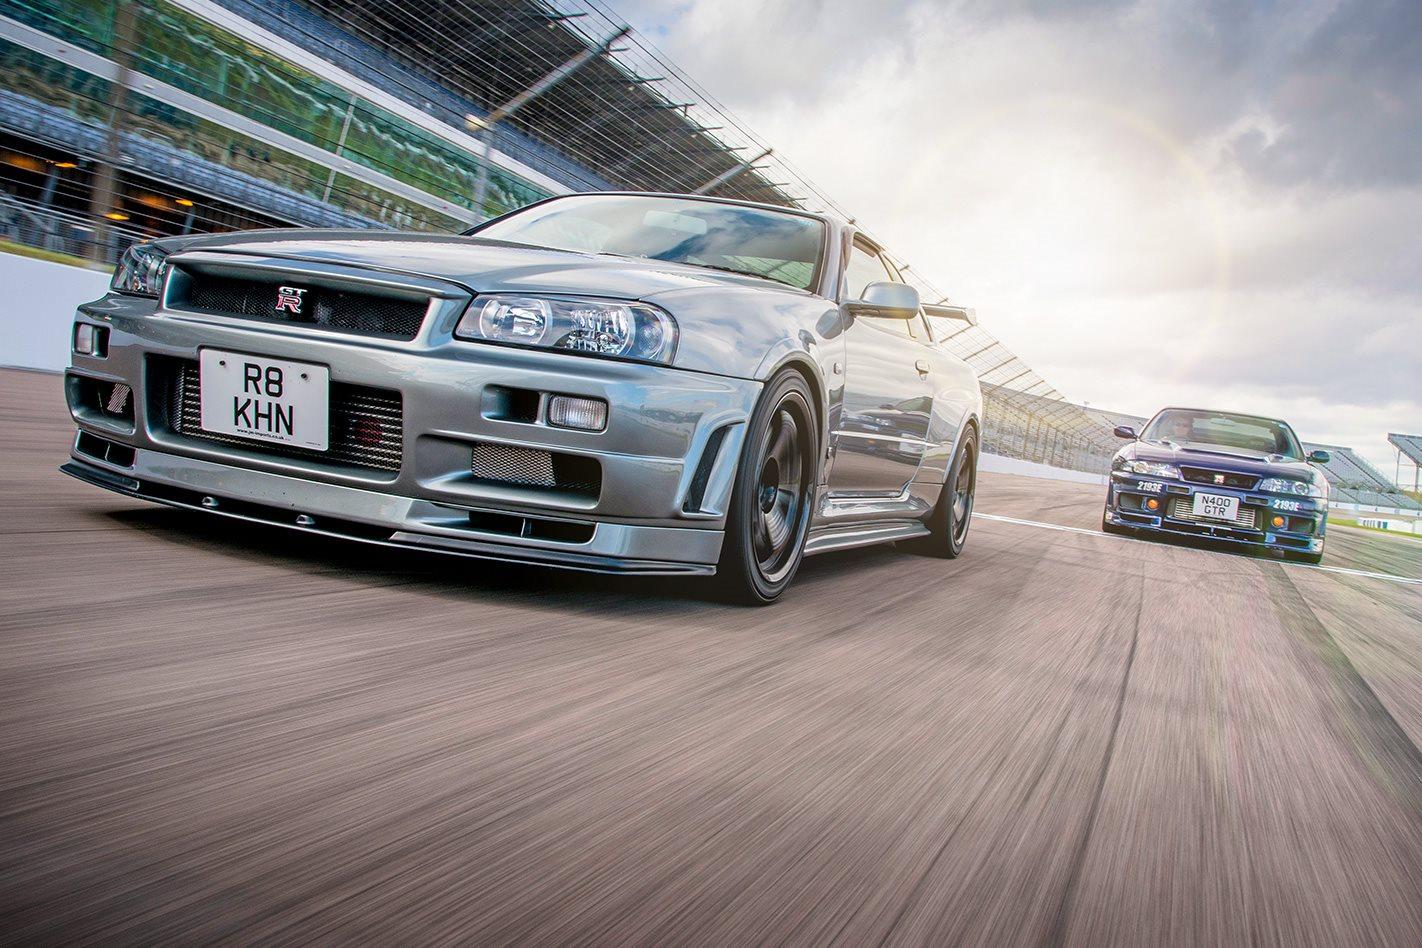 Motor 5 4 Ford Triton >> NISMO GT-R R33 400R & GT-R R34 R-Tune review